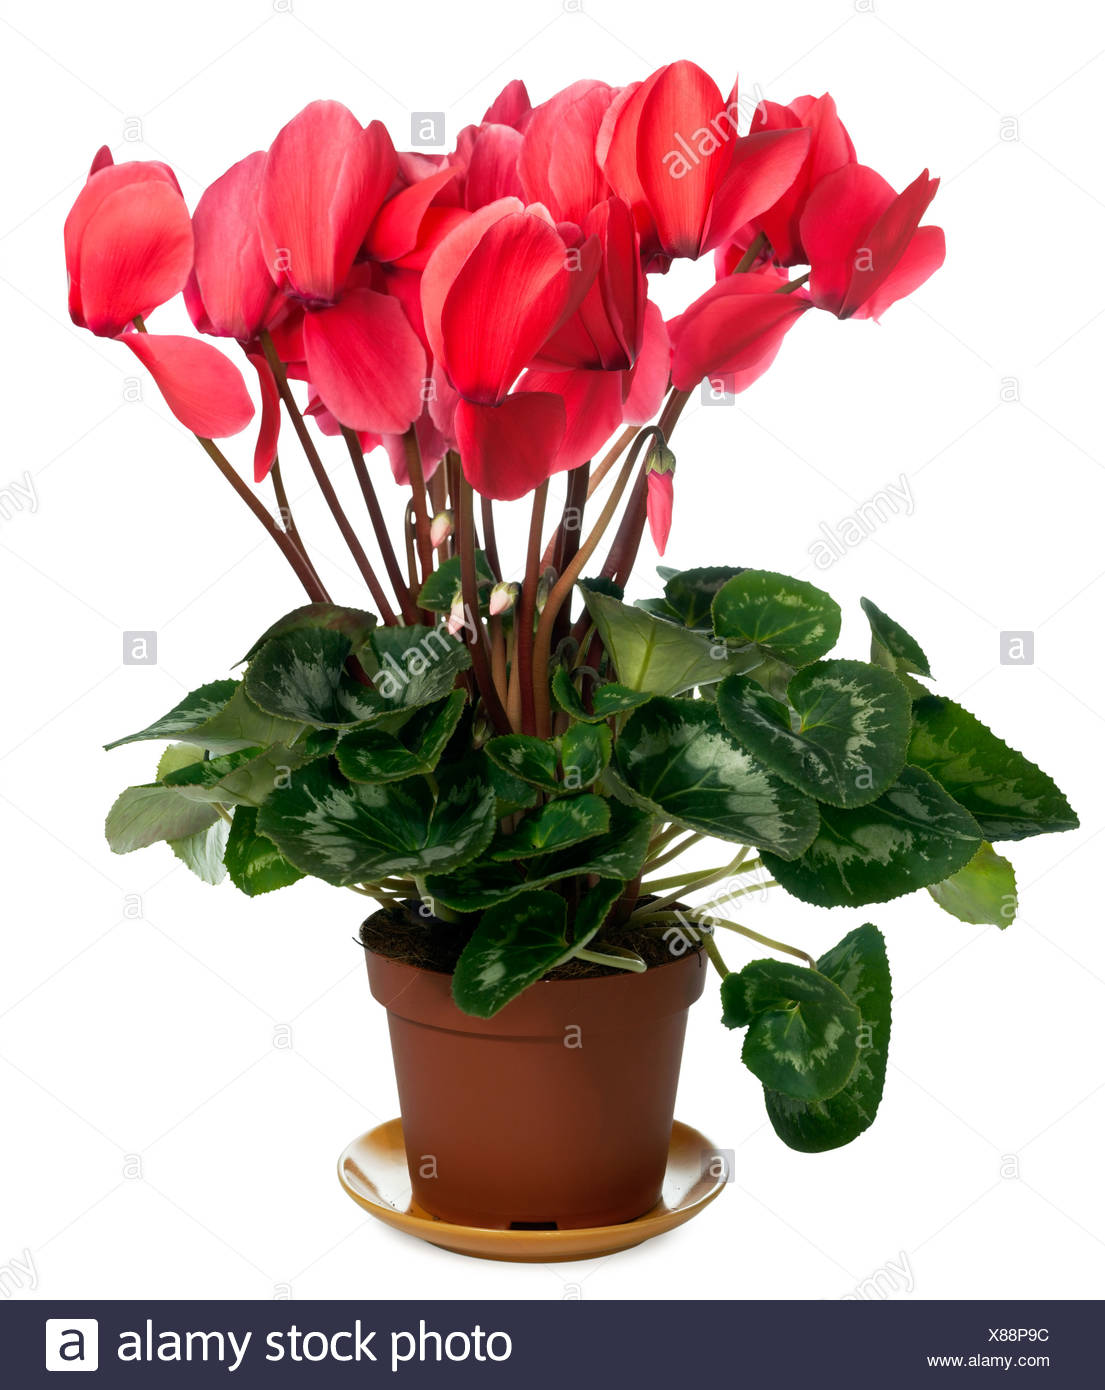 Cyclamen plant - Stock Image